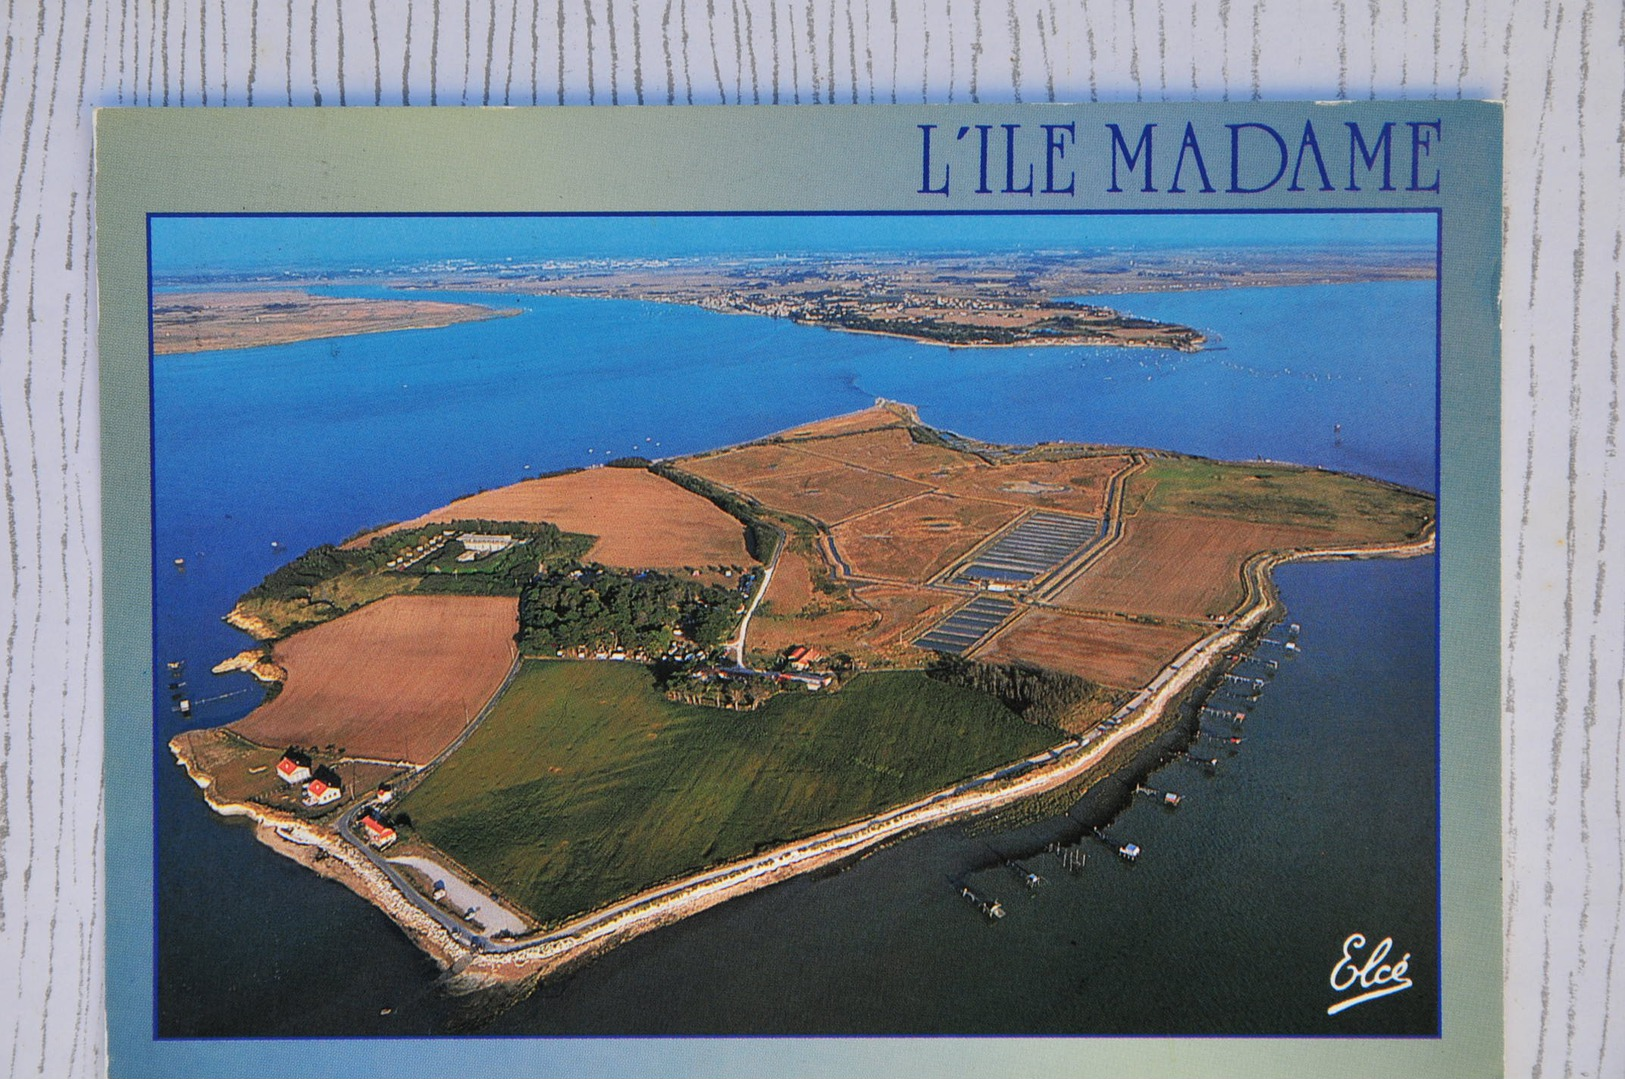 CPM ILE MADAME (17. Charente-Maritime) - Rochefort, Estuaire Charentais - Francia